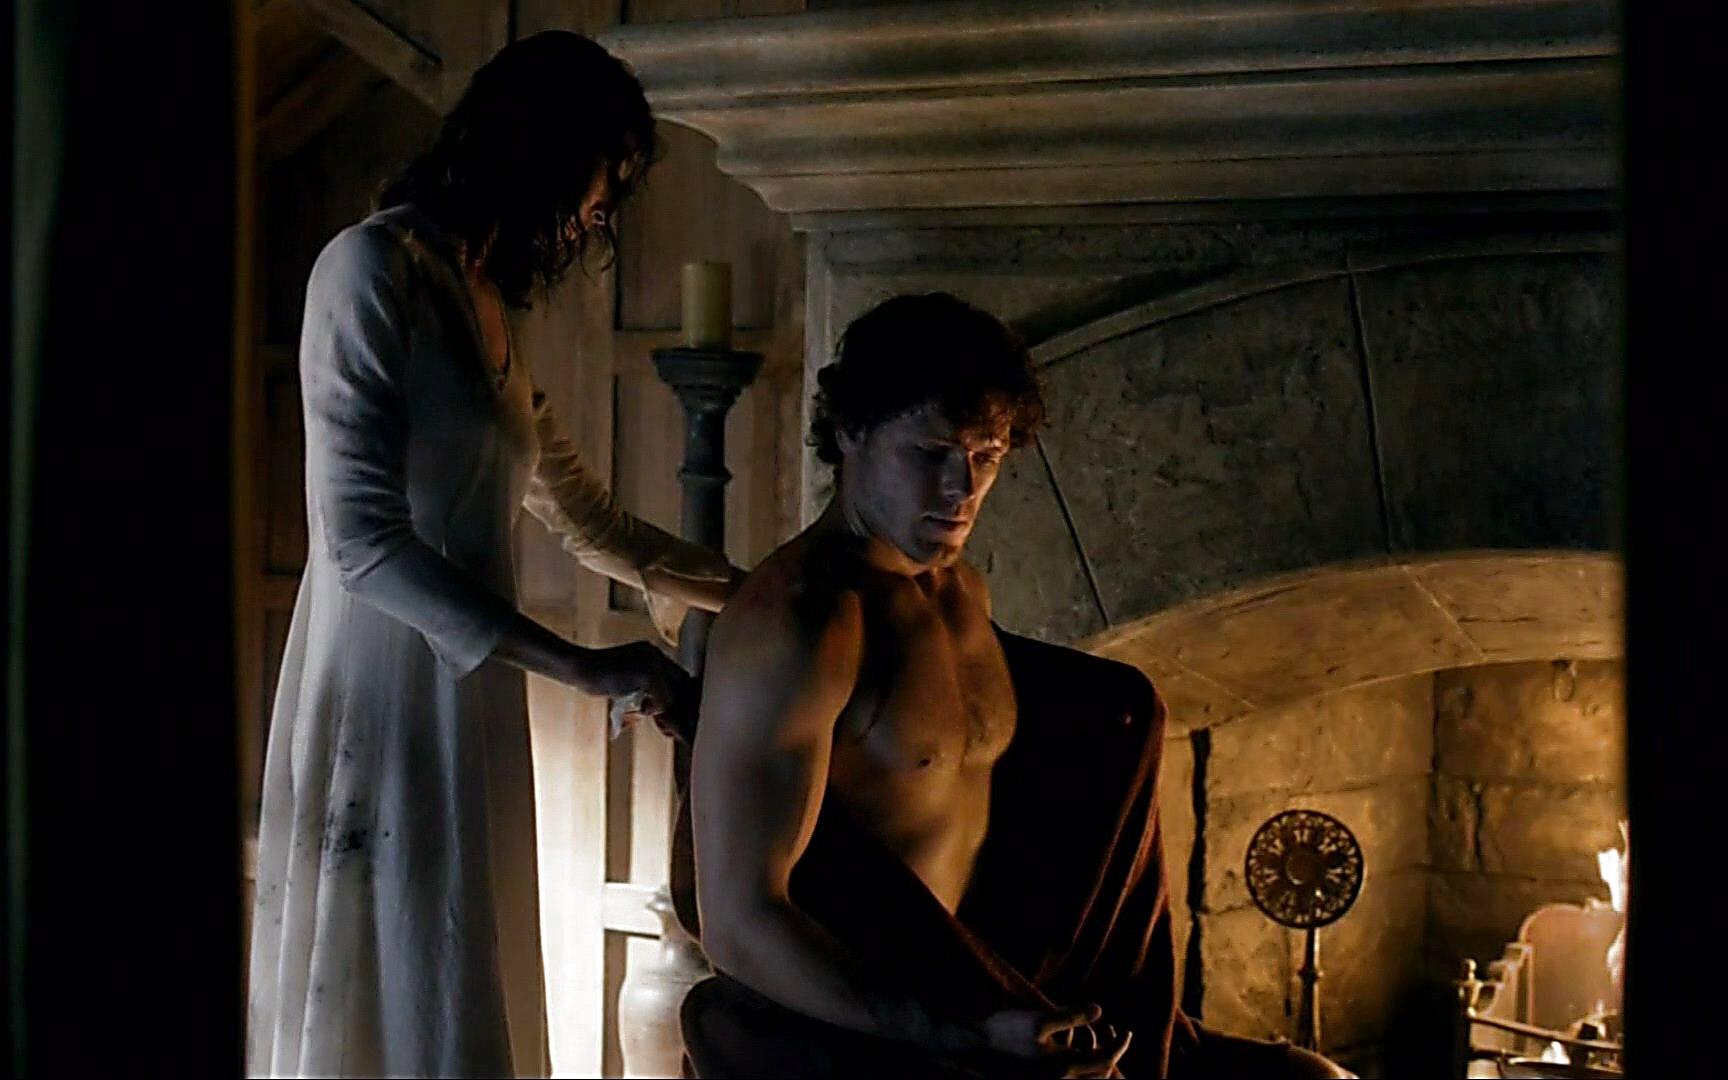 Sam Heughan sexy shirtless scene January 3, 2015, 5pm